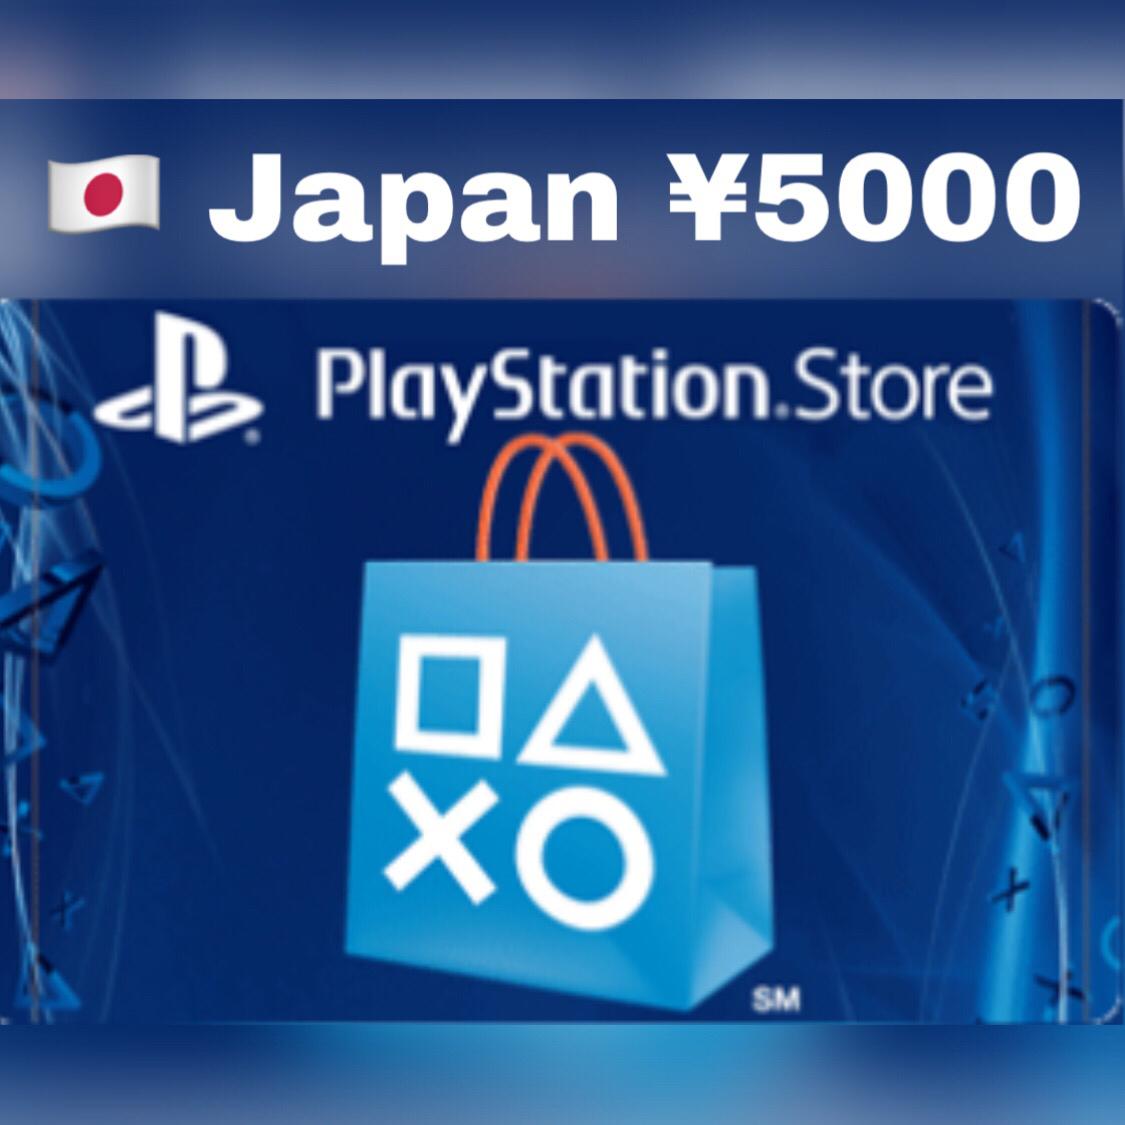 Playstation Network Card Japan 5000 yen